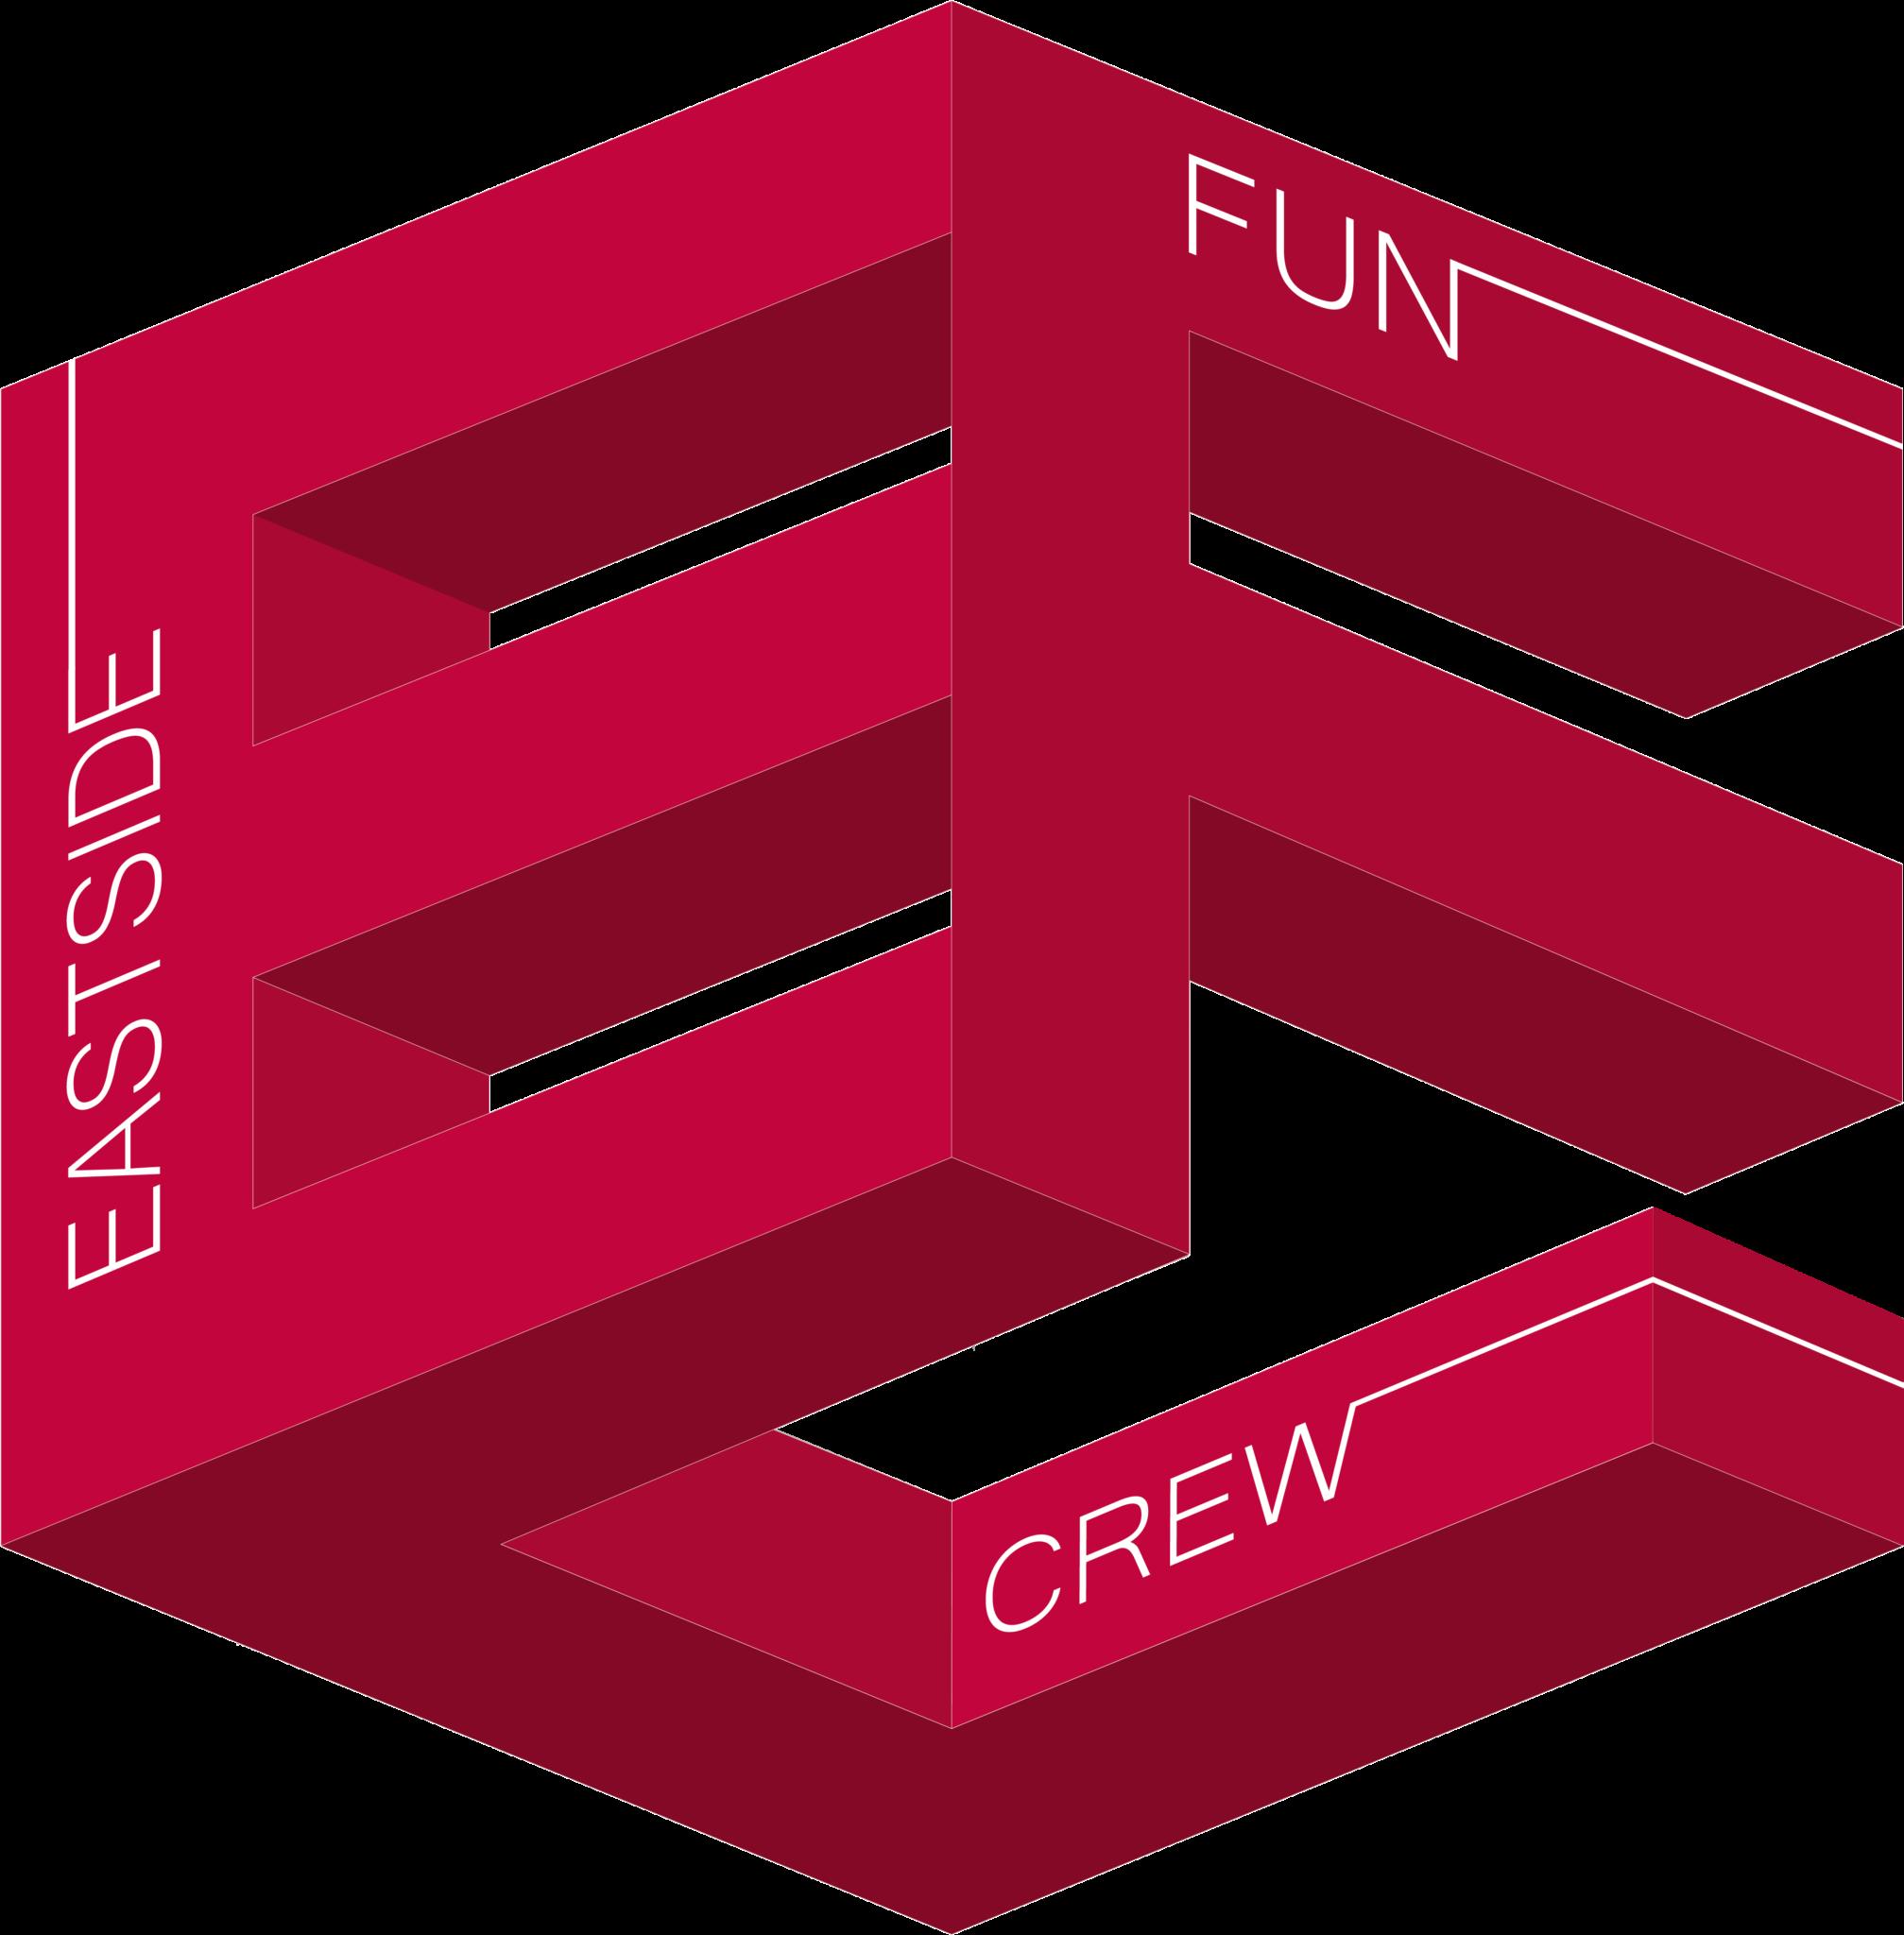 Eastside Fun Crew